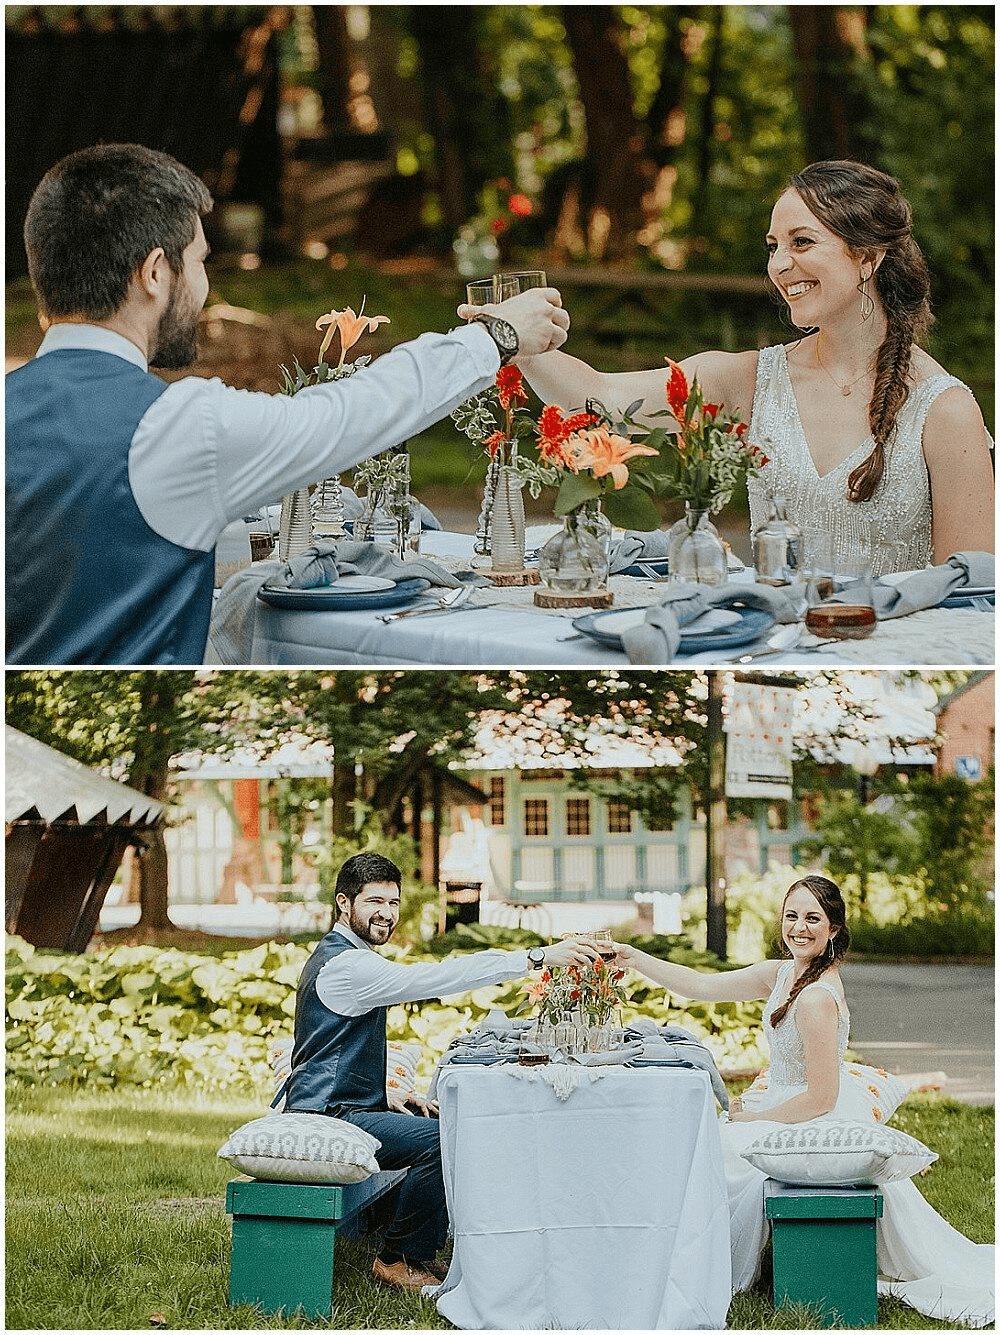 Summer_Boho_Wedding_Inspiration_Marryland_Weddings_Blog_15.jpg